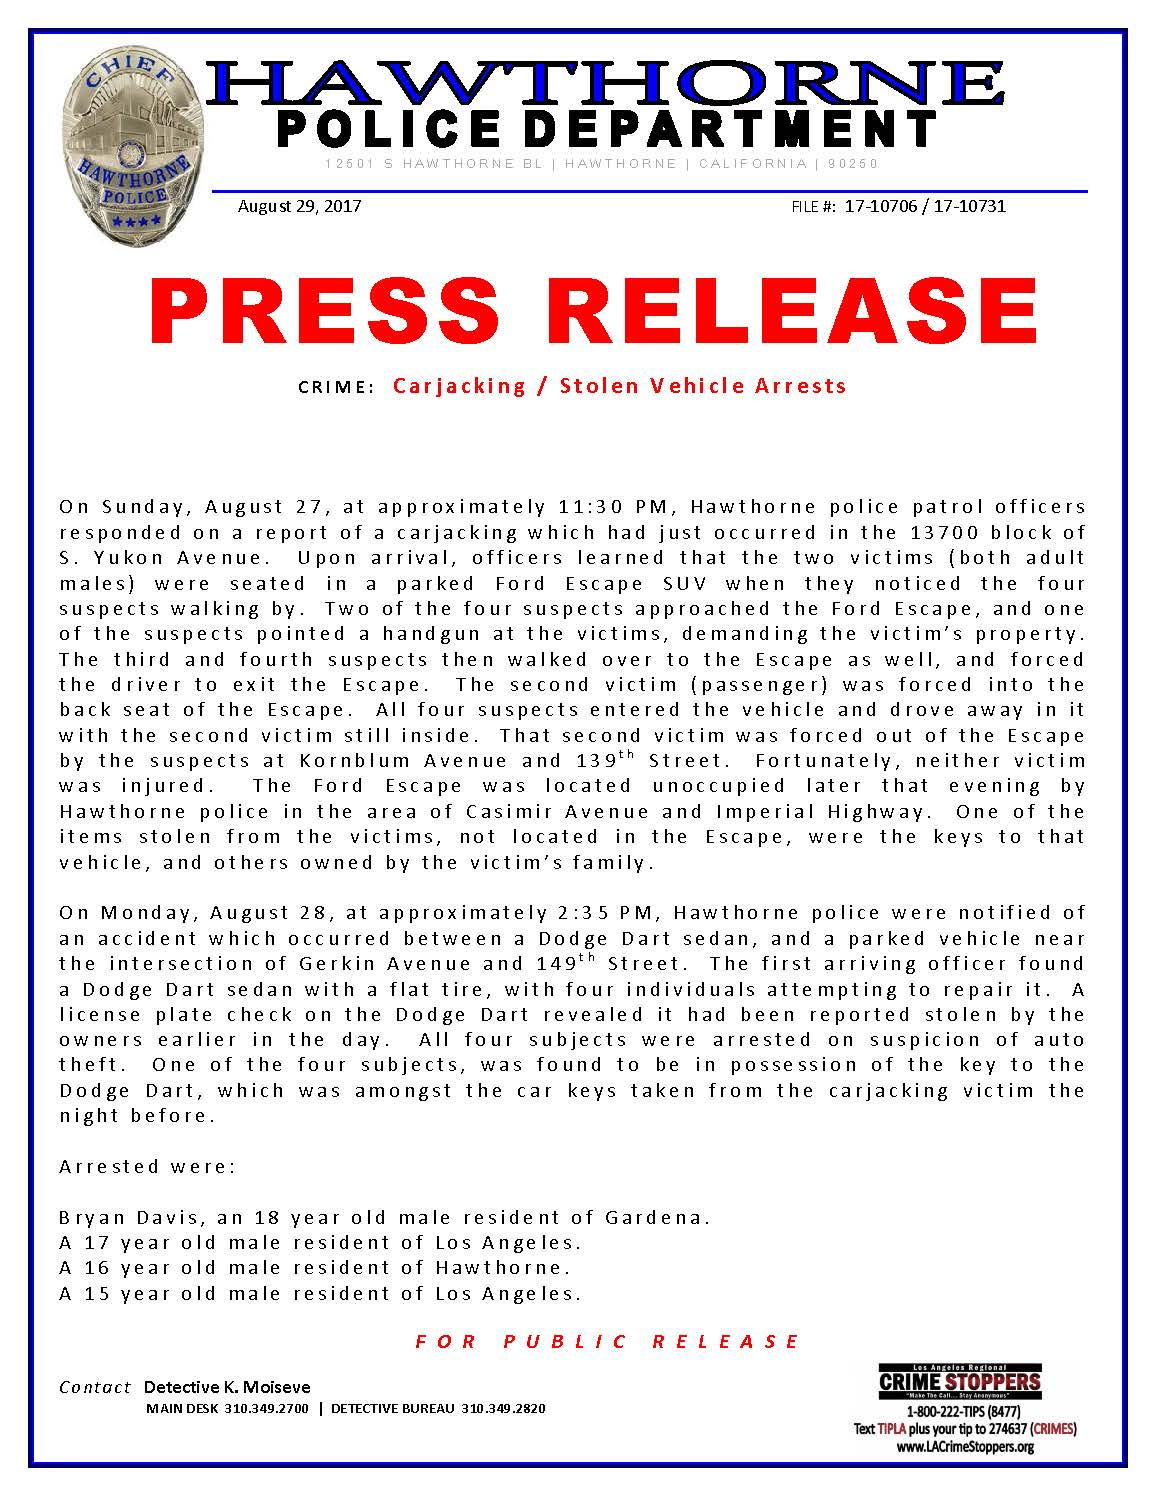 Carjacking stolen vehicle - arrests page 1